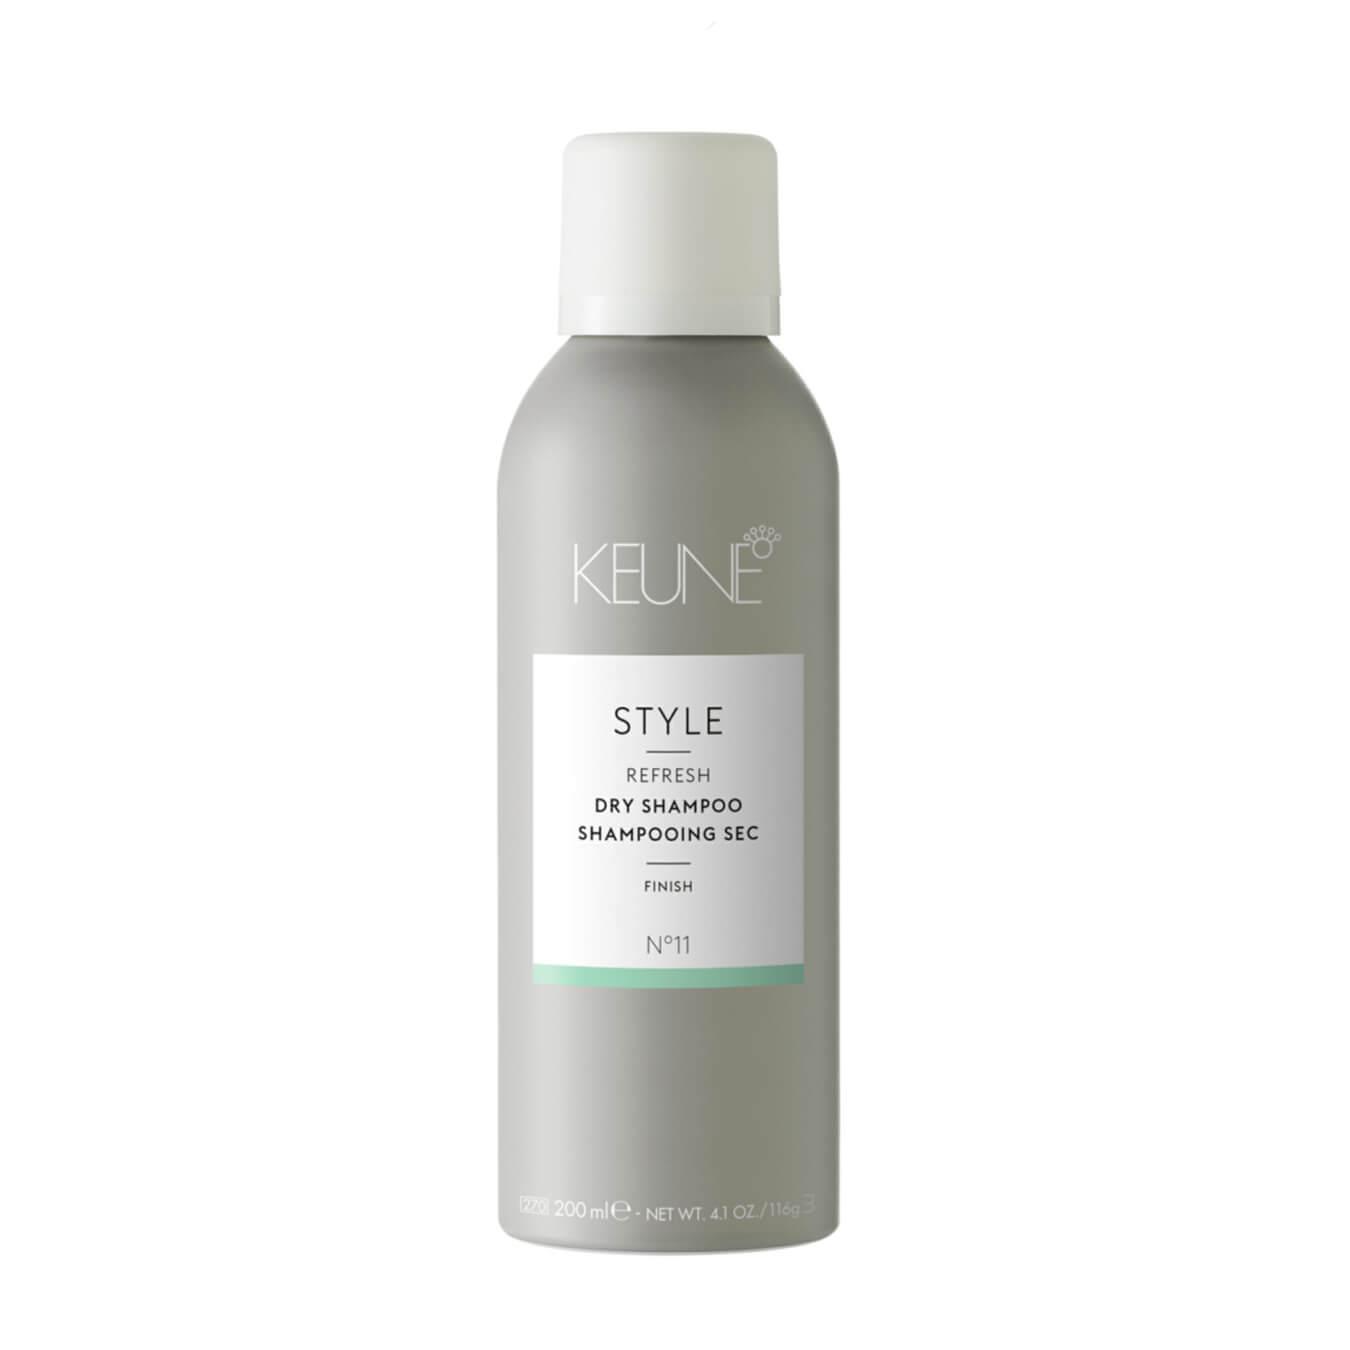 Kauf Keune Style Dry Shampoo 200ml